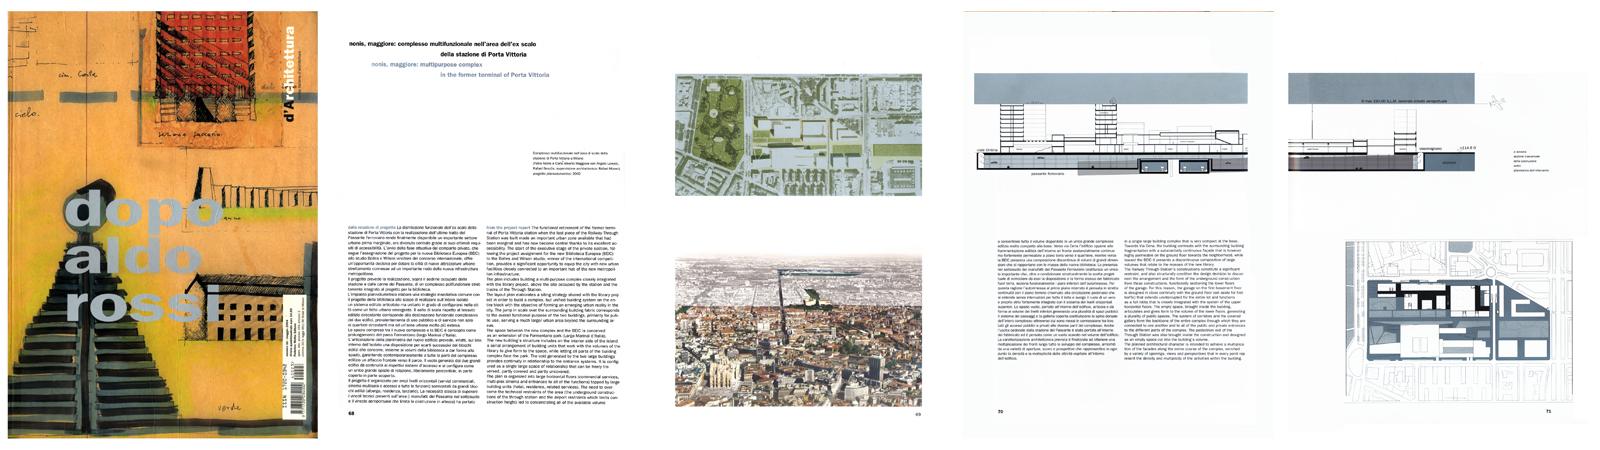 D'Architettura, n°23, aprile 2004, pag.48